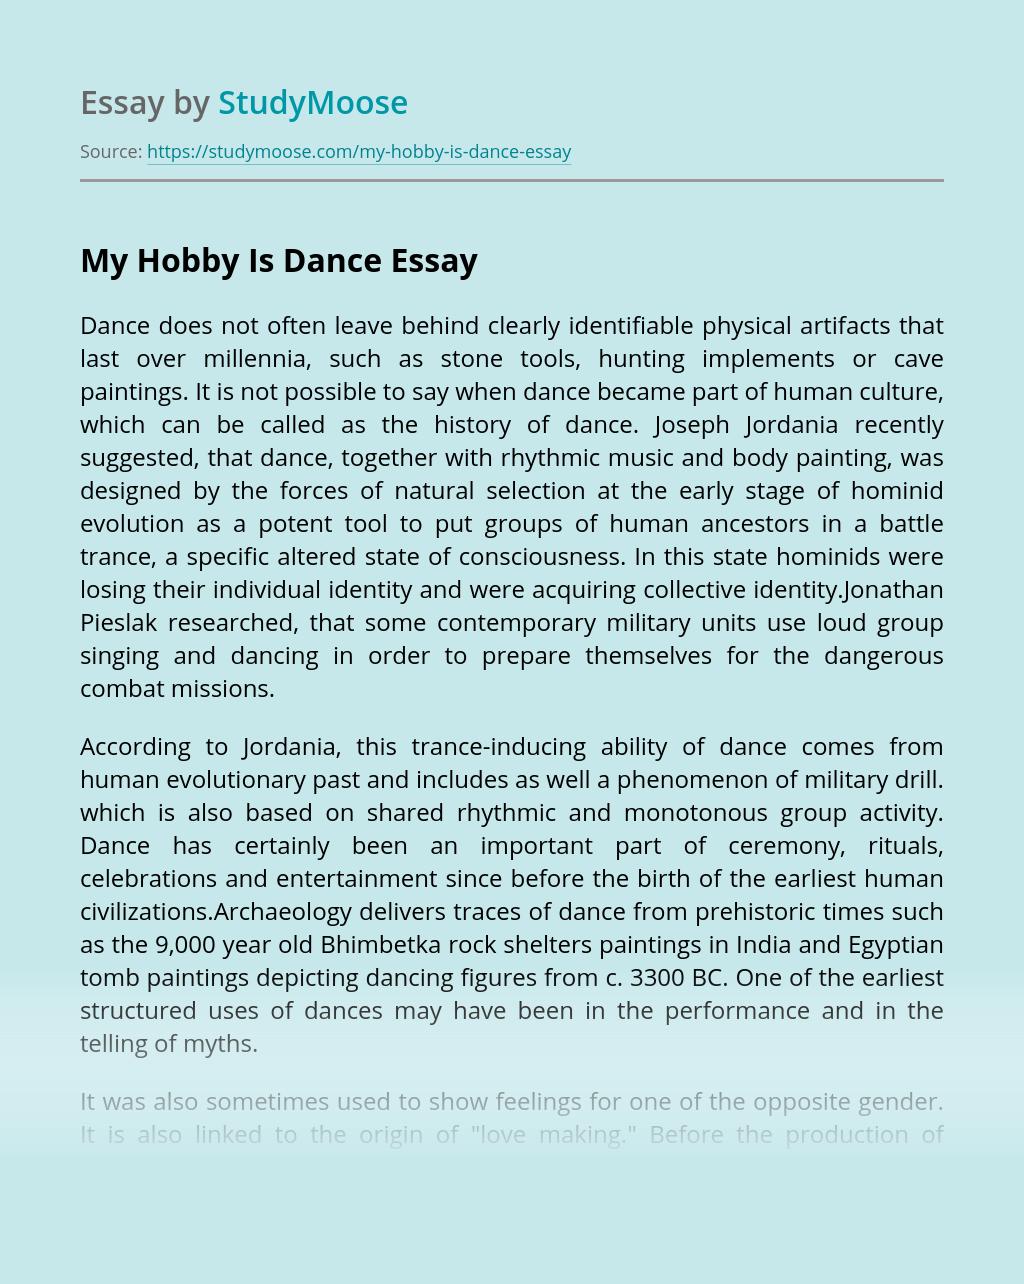 My Hobby Is Dance